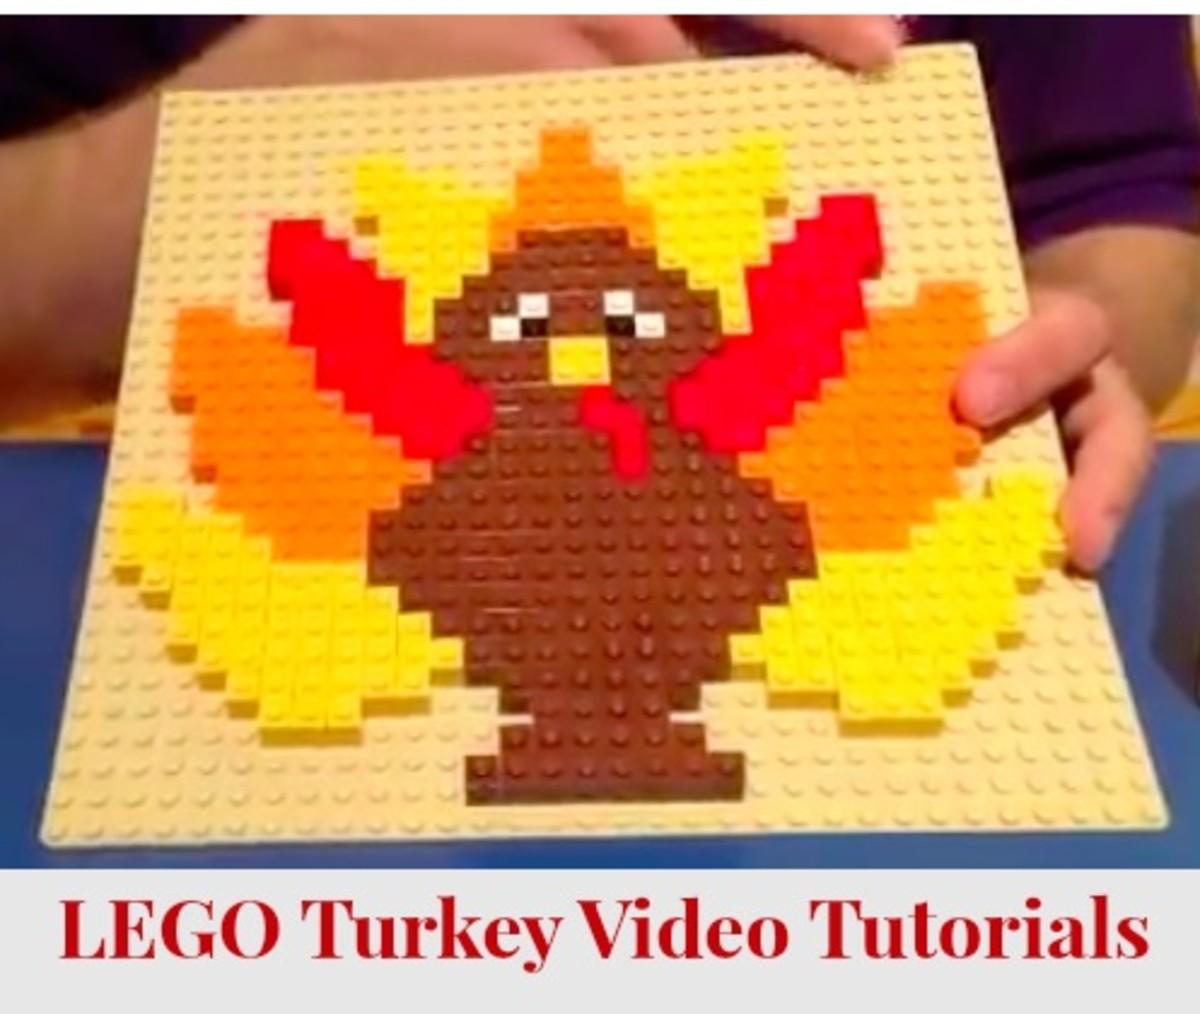 LEGO Turkey Video Tutorials